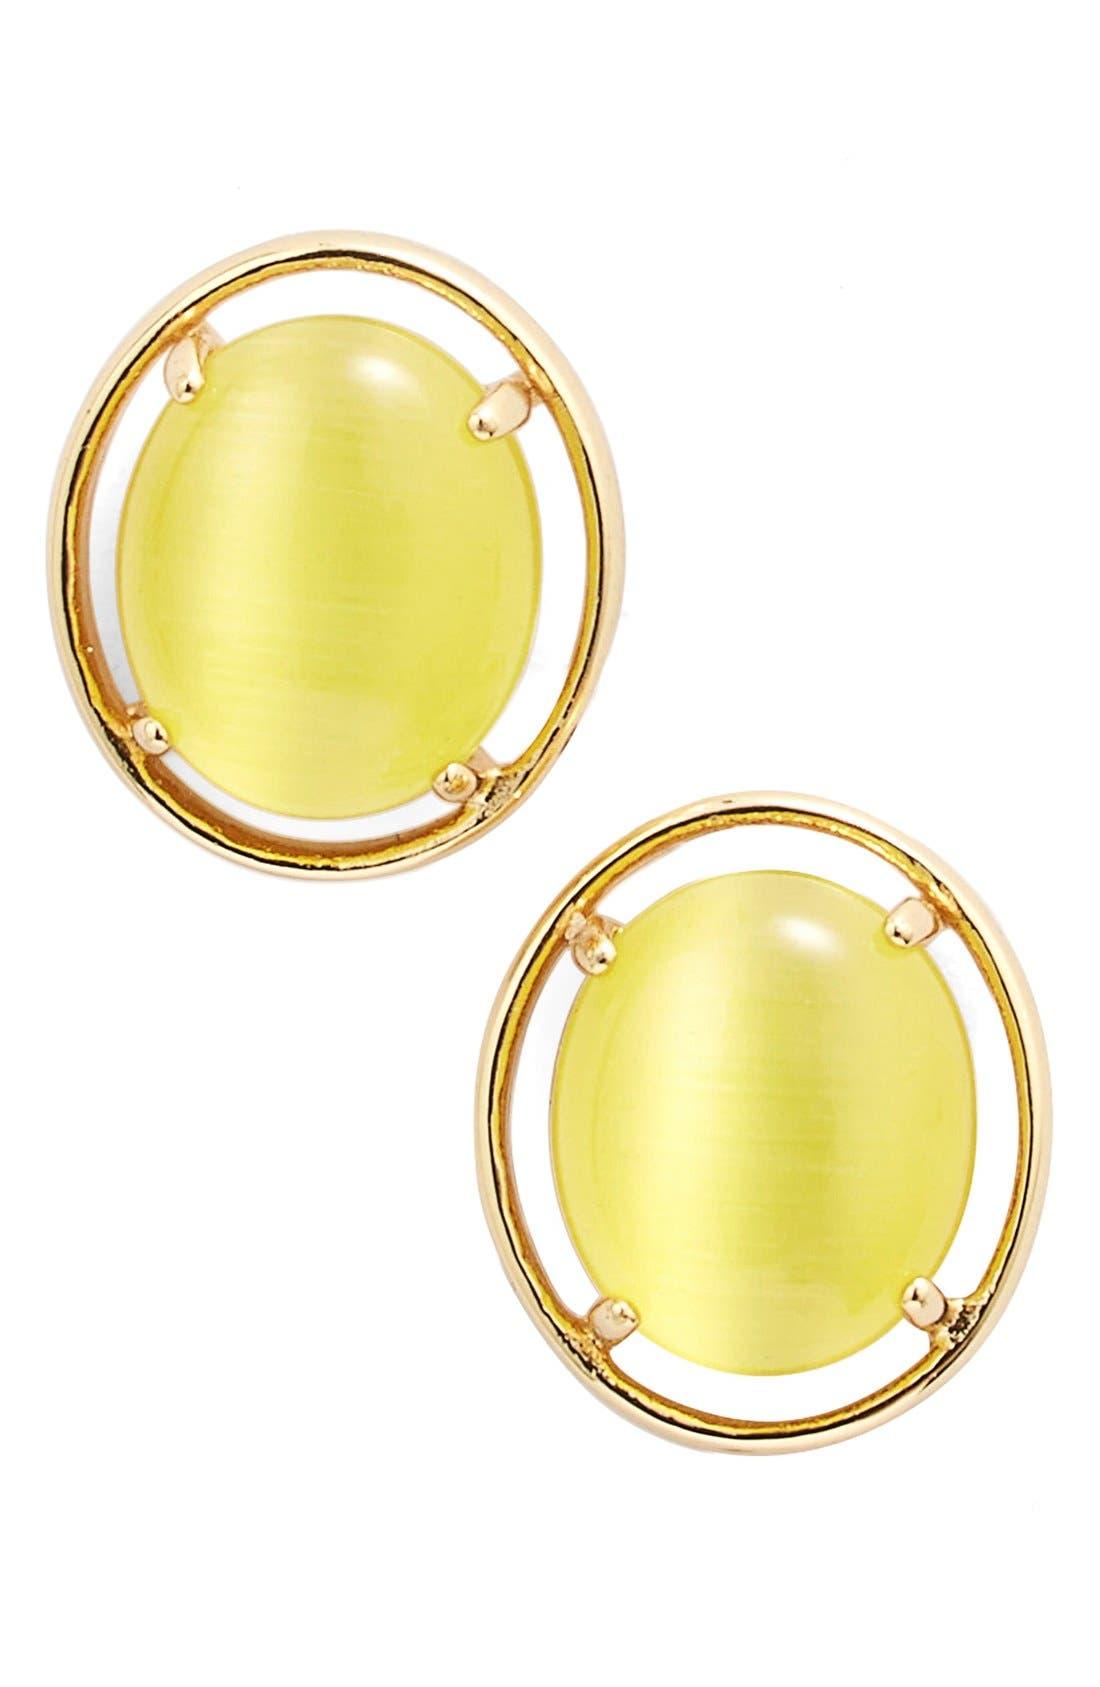 Main Image - kate spade new york open rim stud earrings